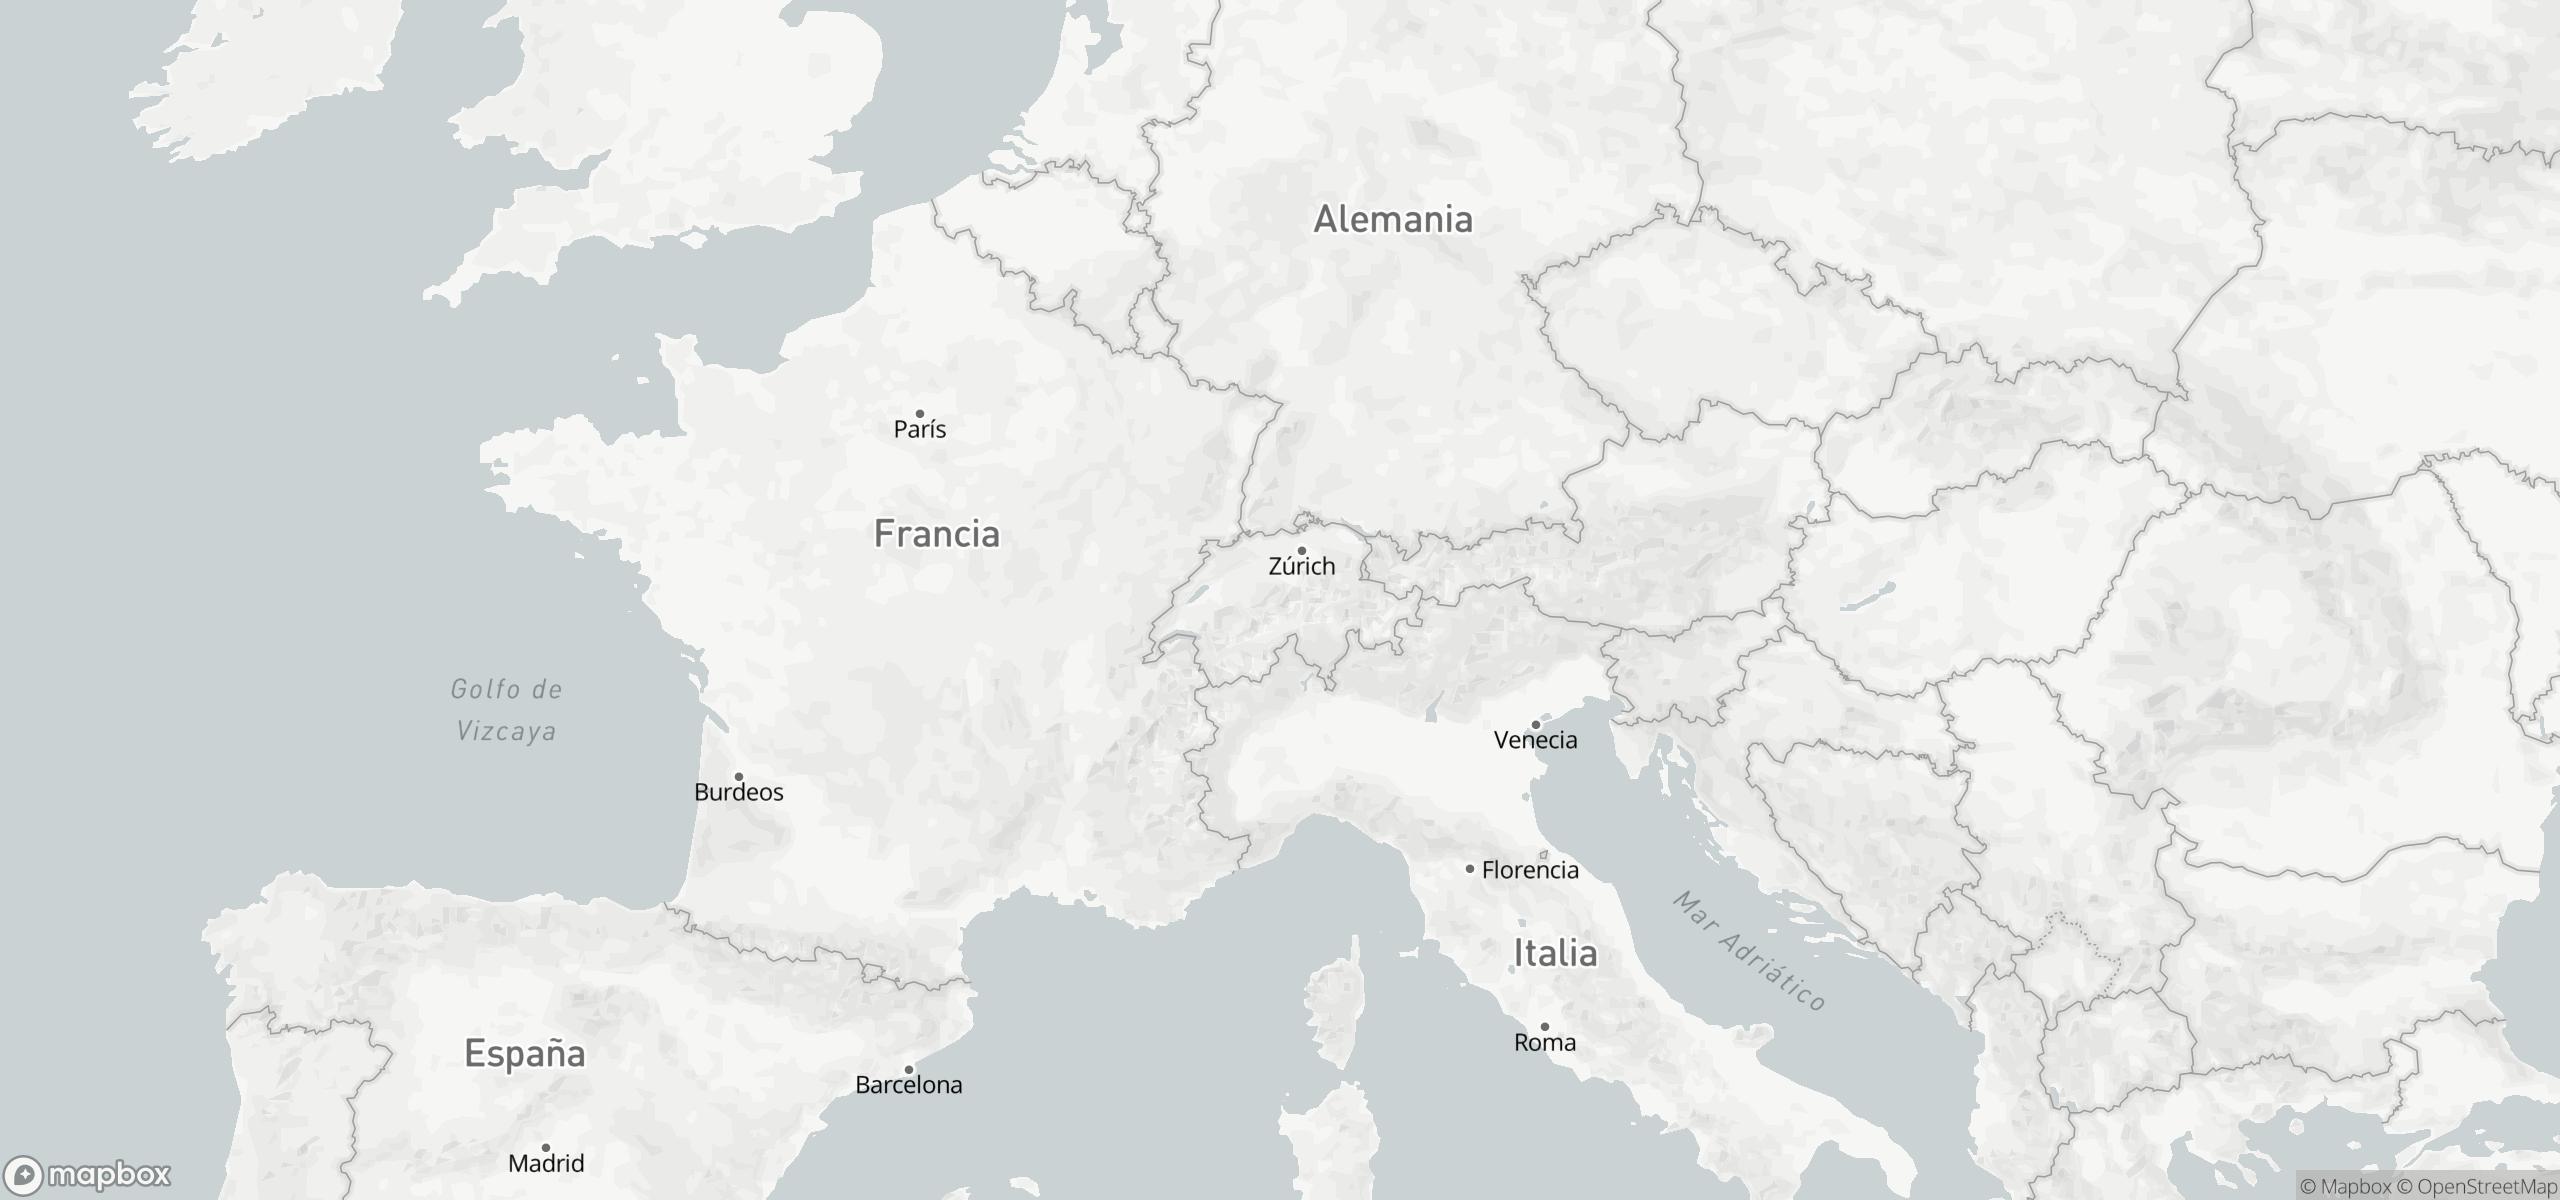 maseuropa_MAD_MAD_L_EUROPA_24